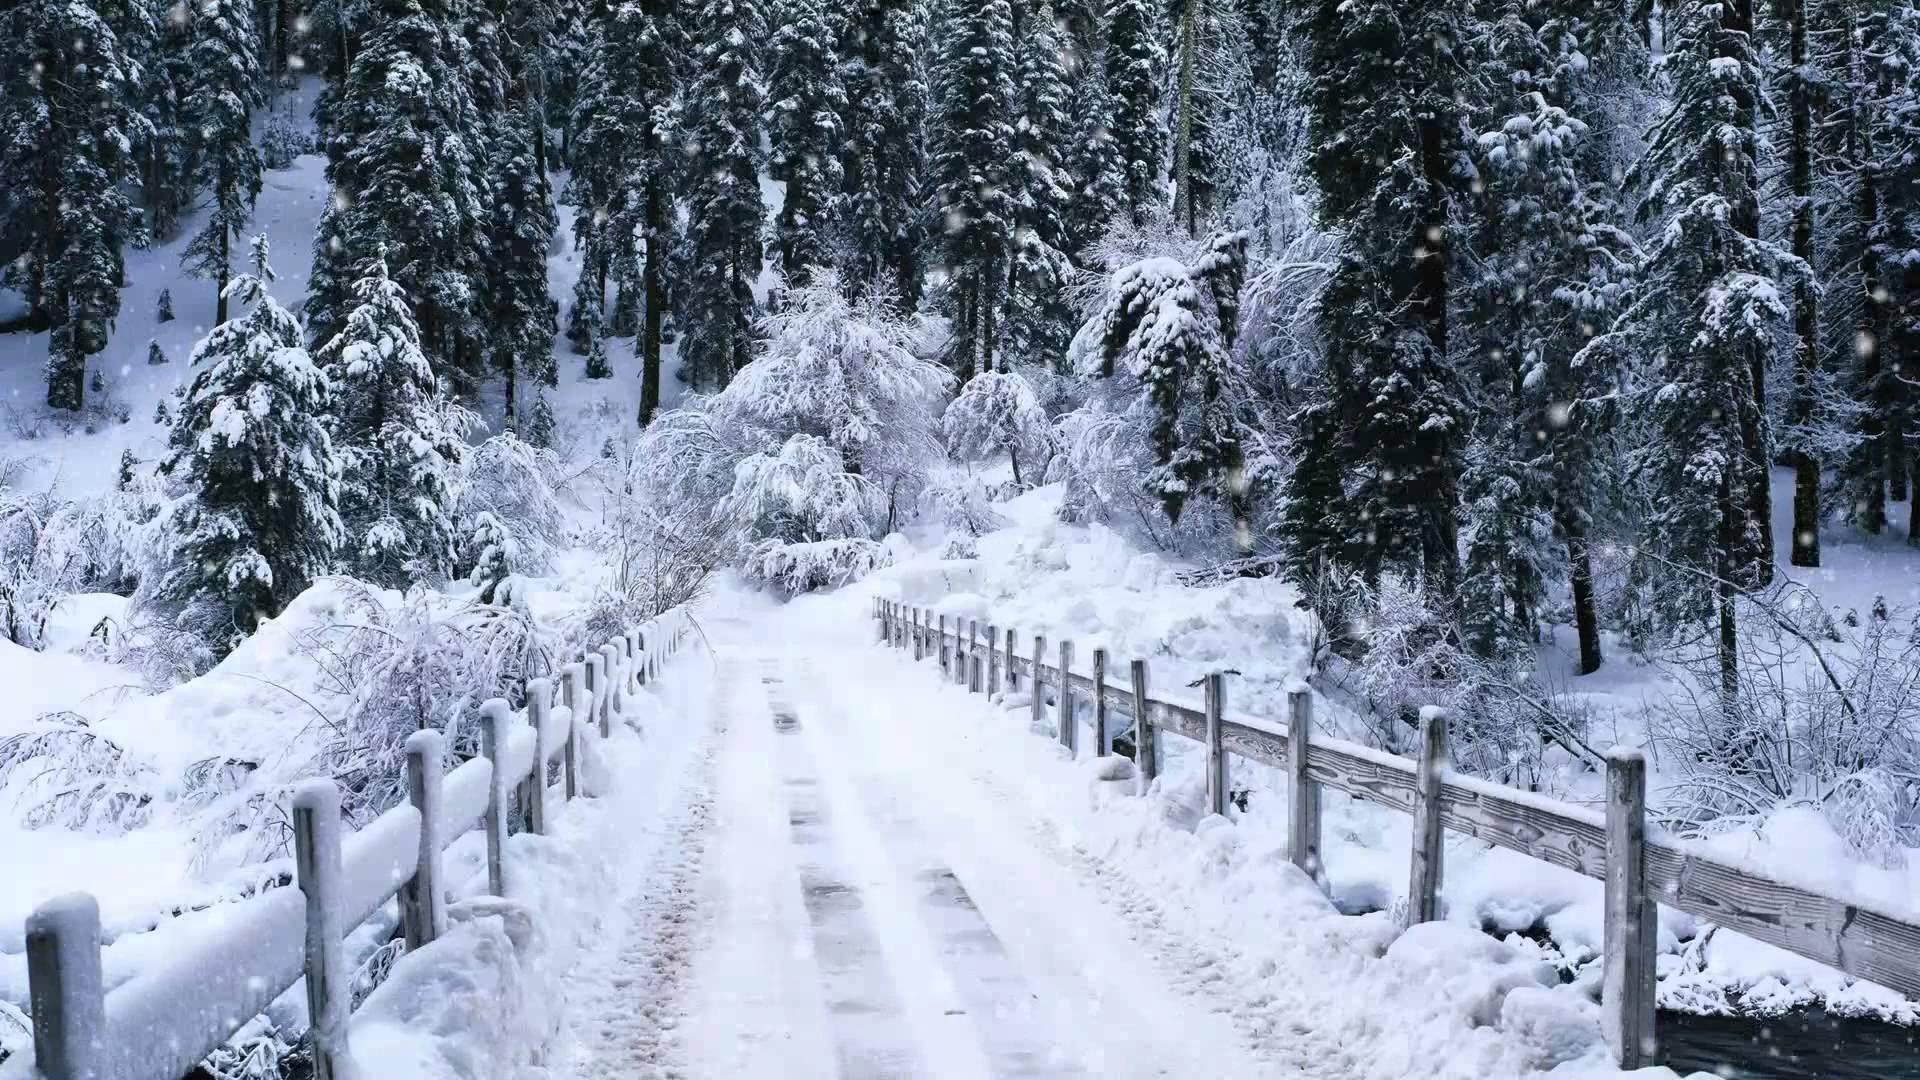 free snowflakes falling wallpaper 37170